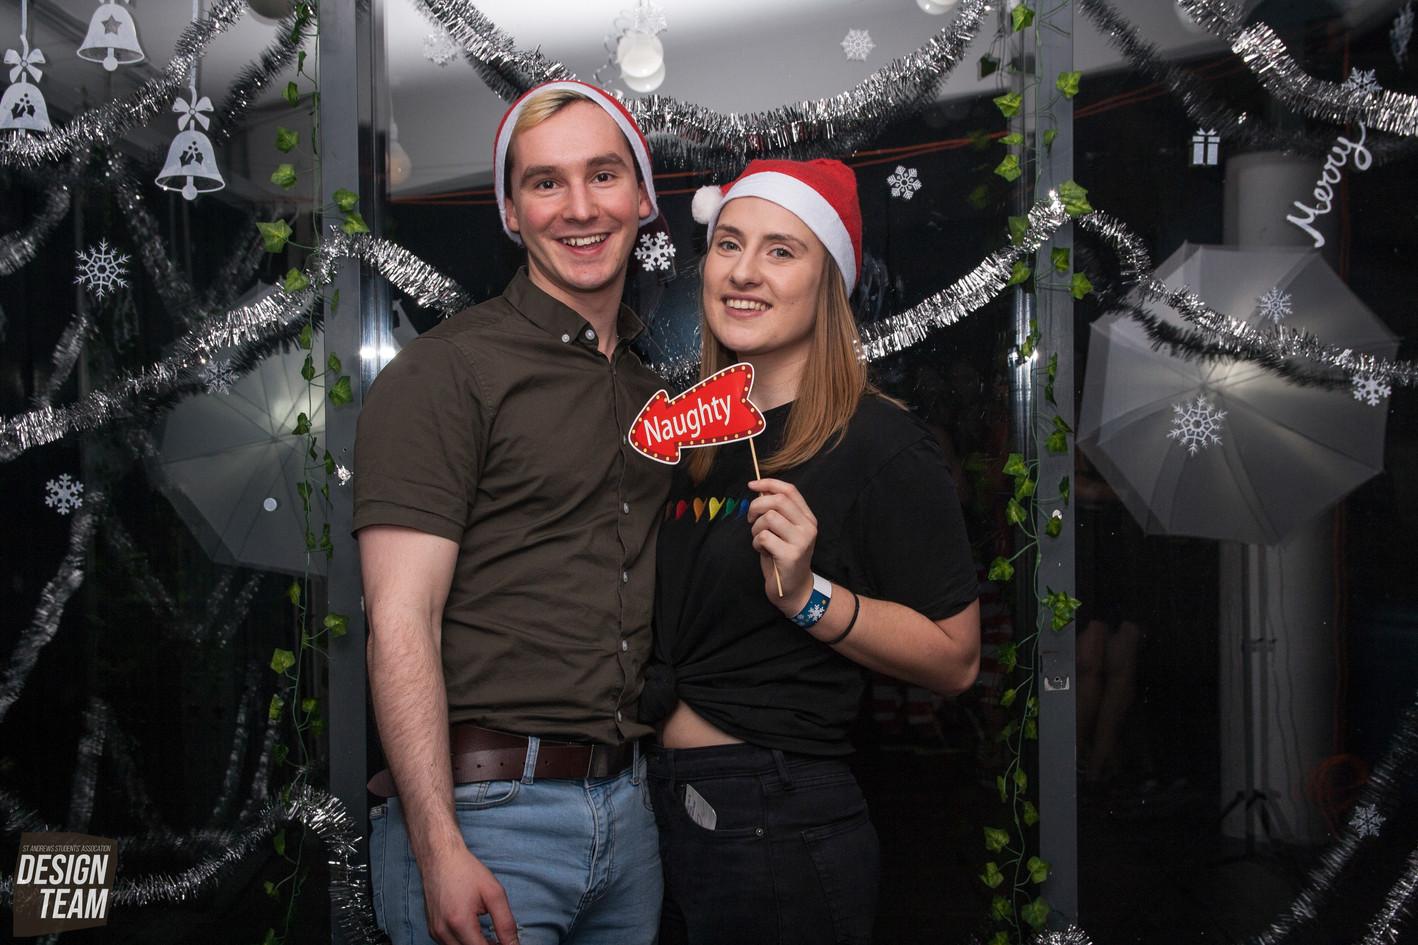 Christmas Photobooth by Erika Gravina and Rebekka Uhl